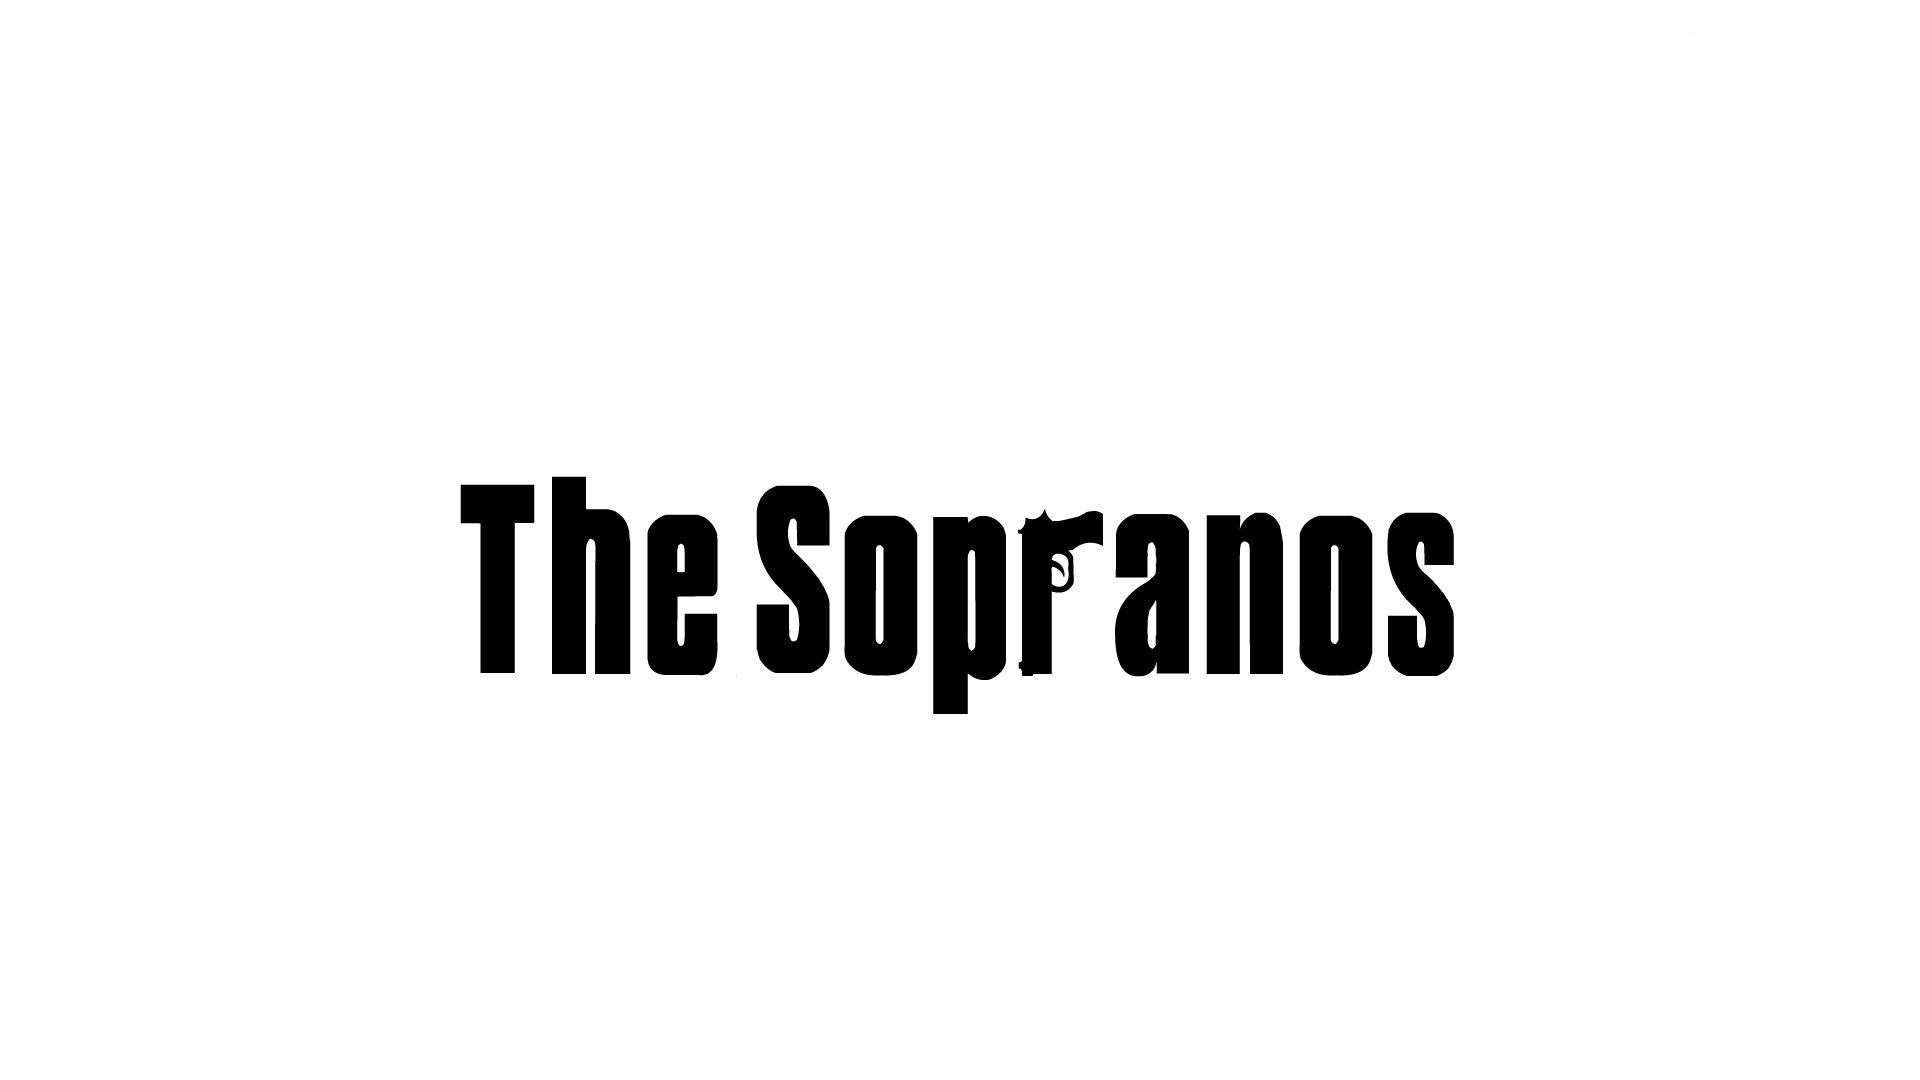 The Sopranos wallpaper 3